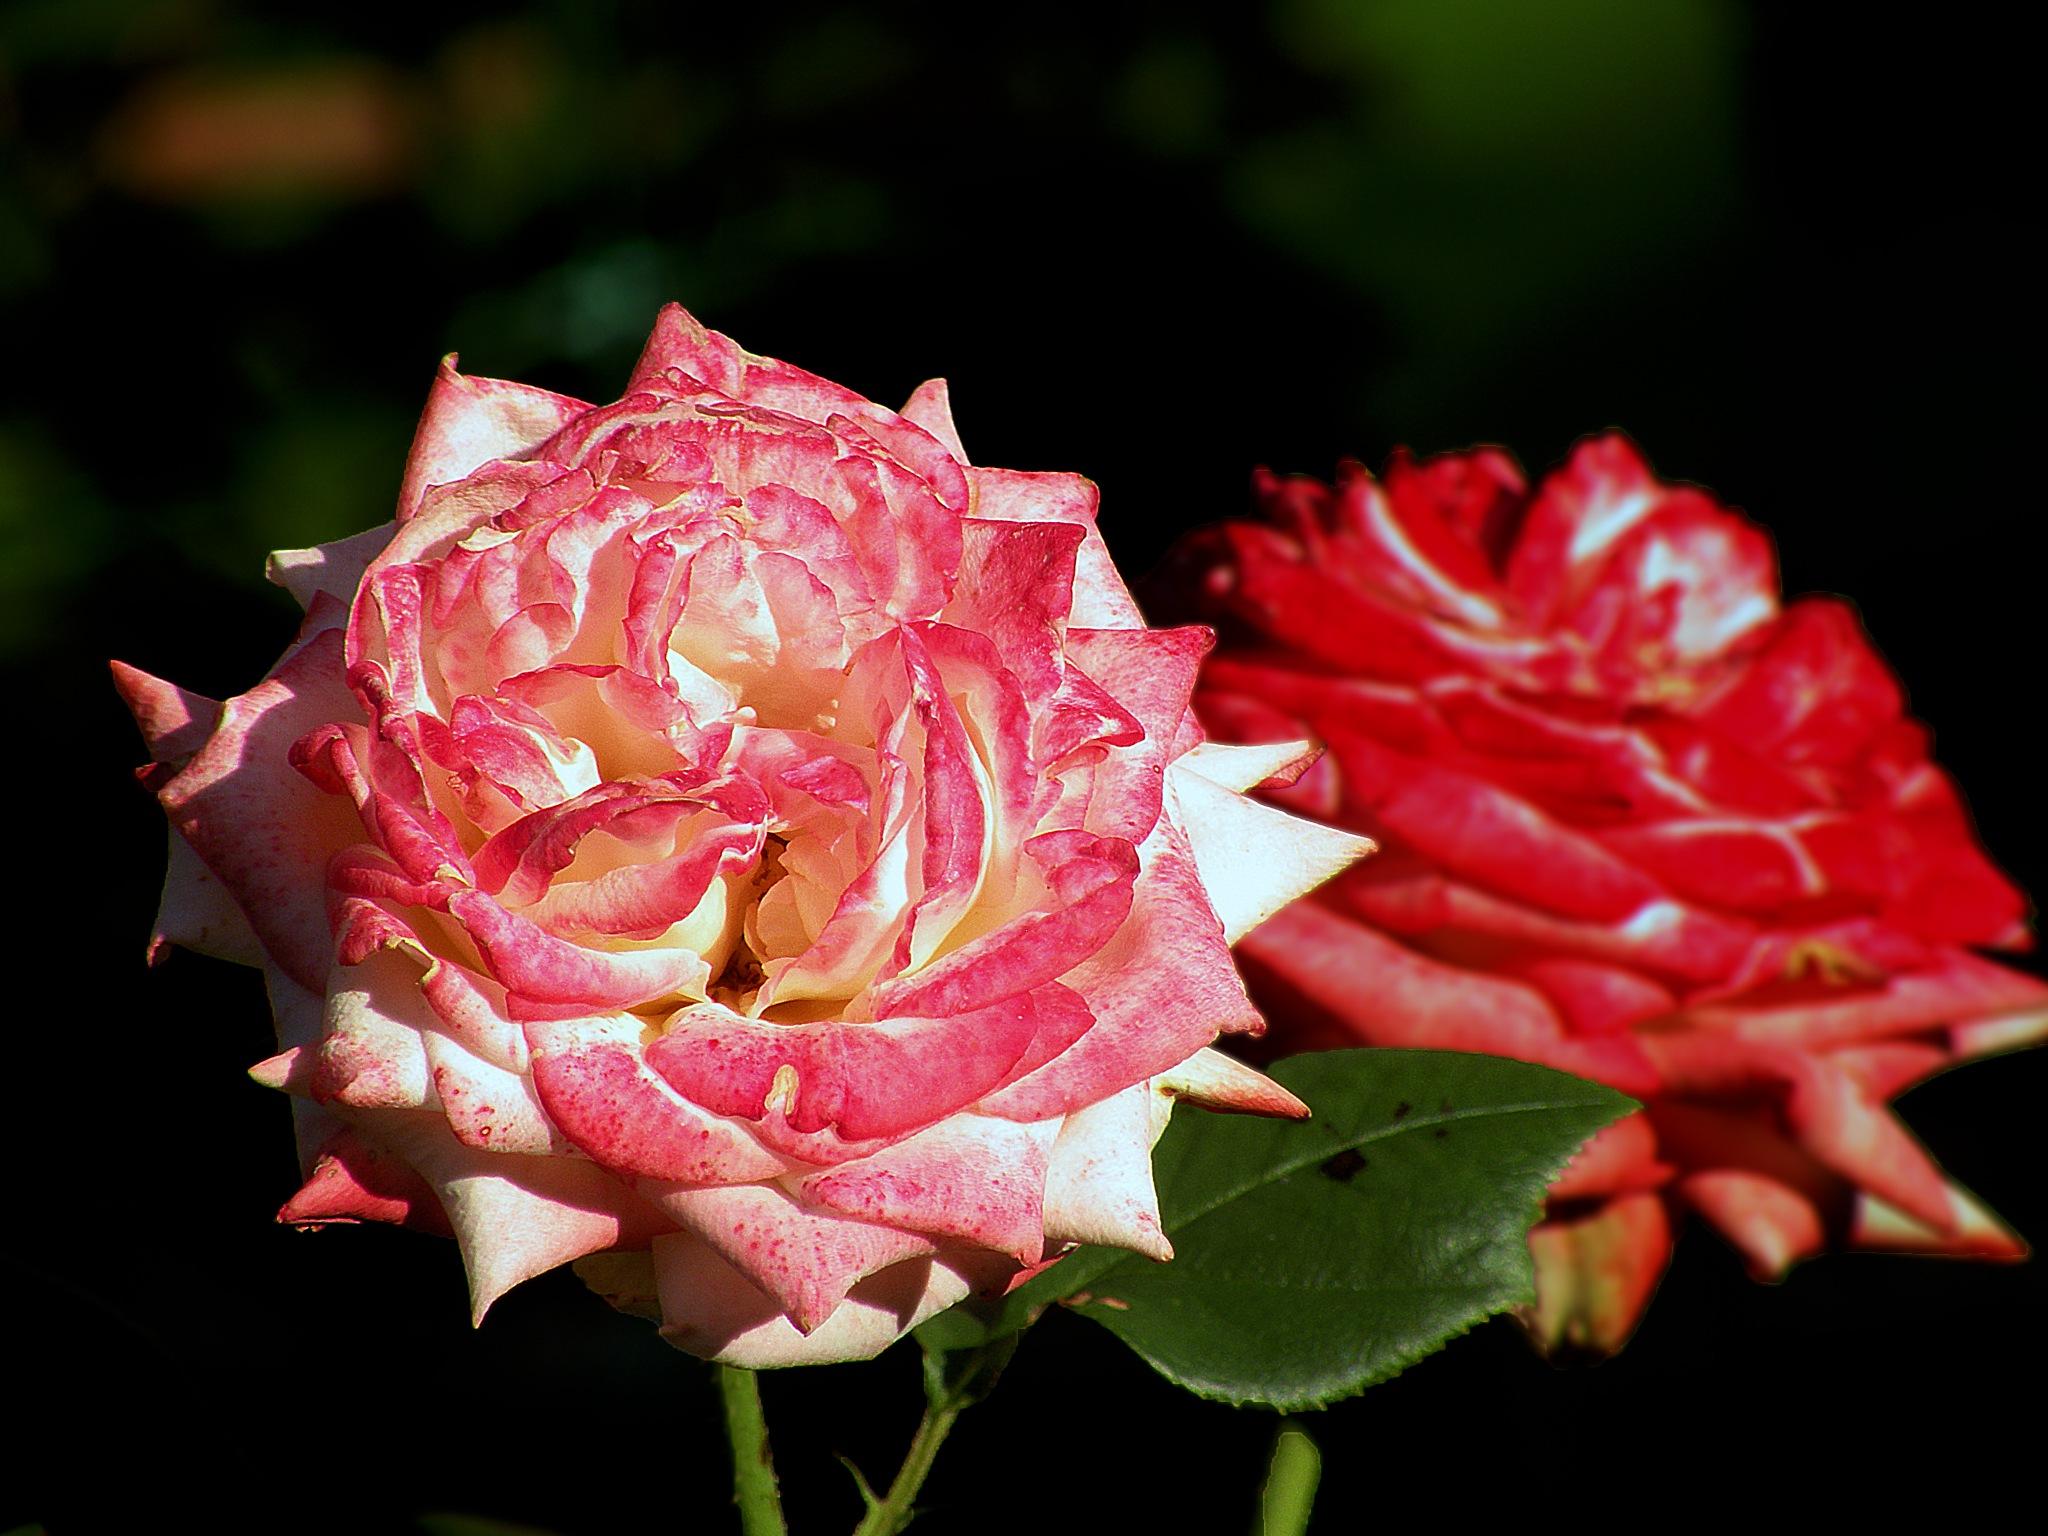 Rose by Alexandr  V. Seleznov